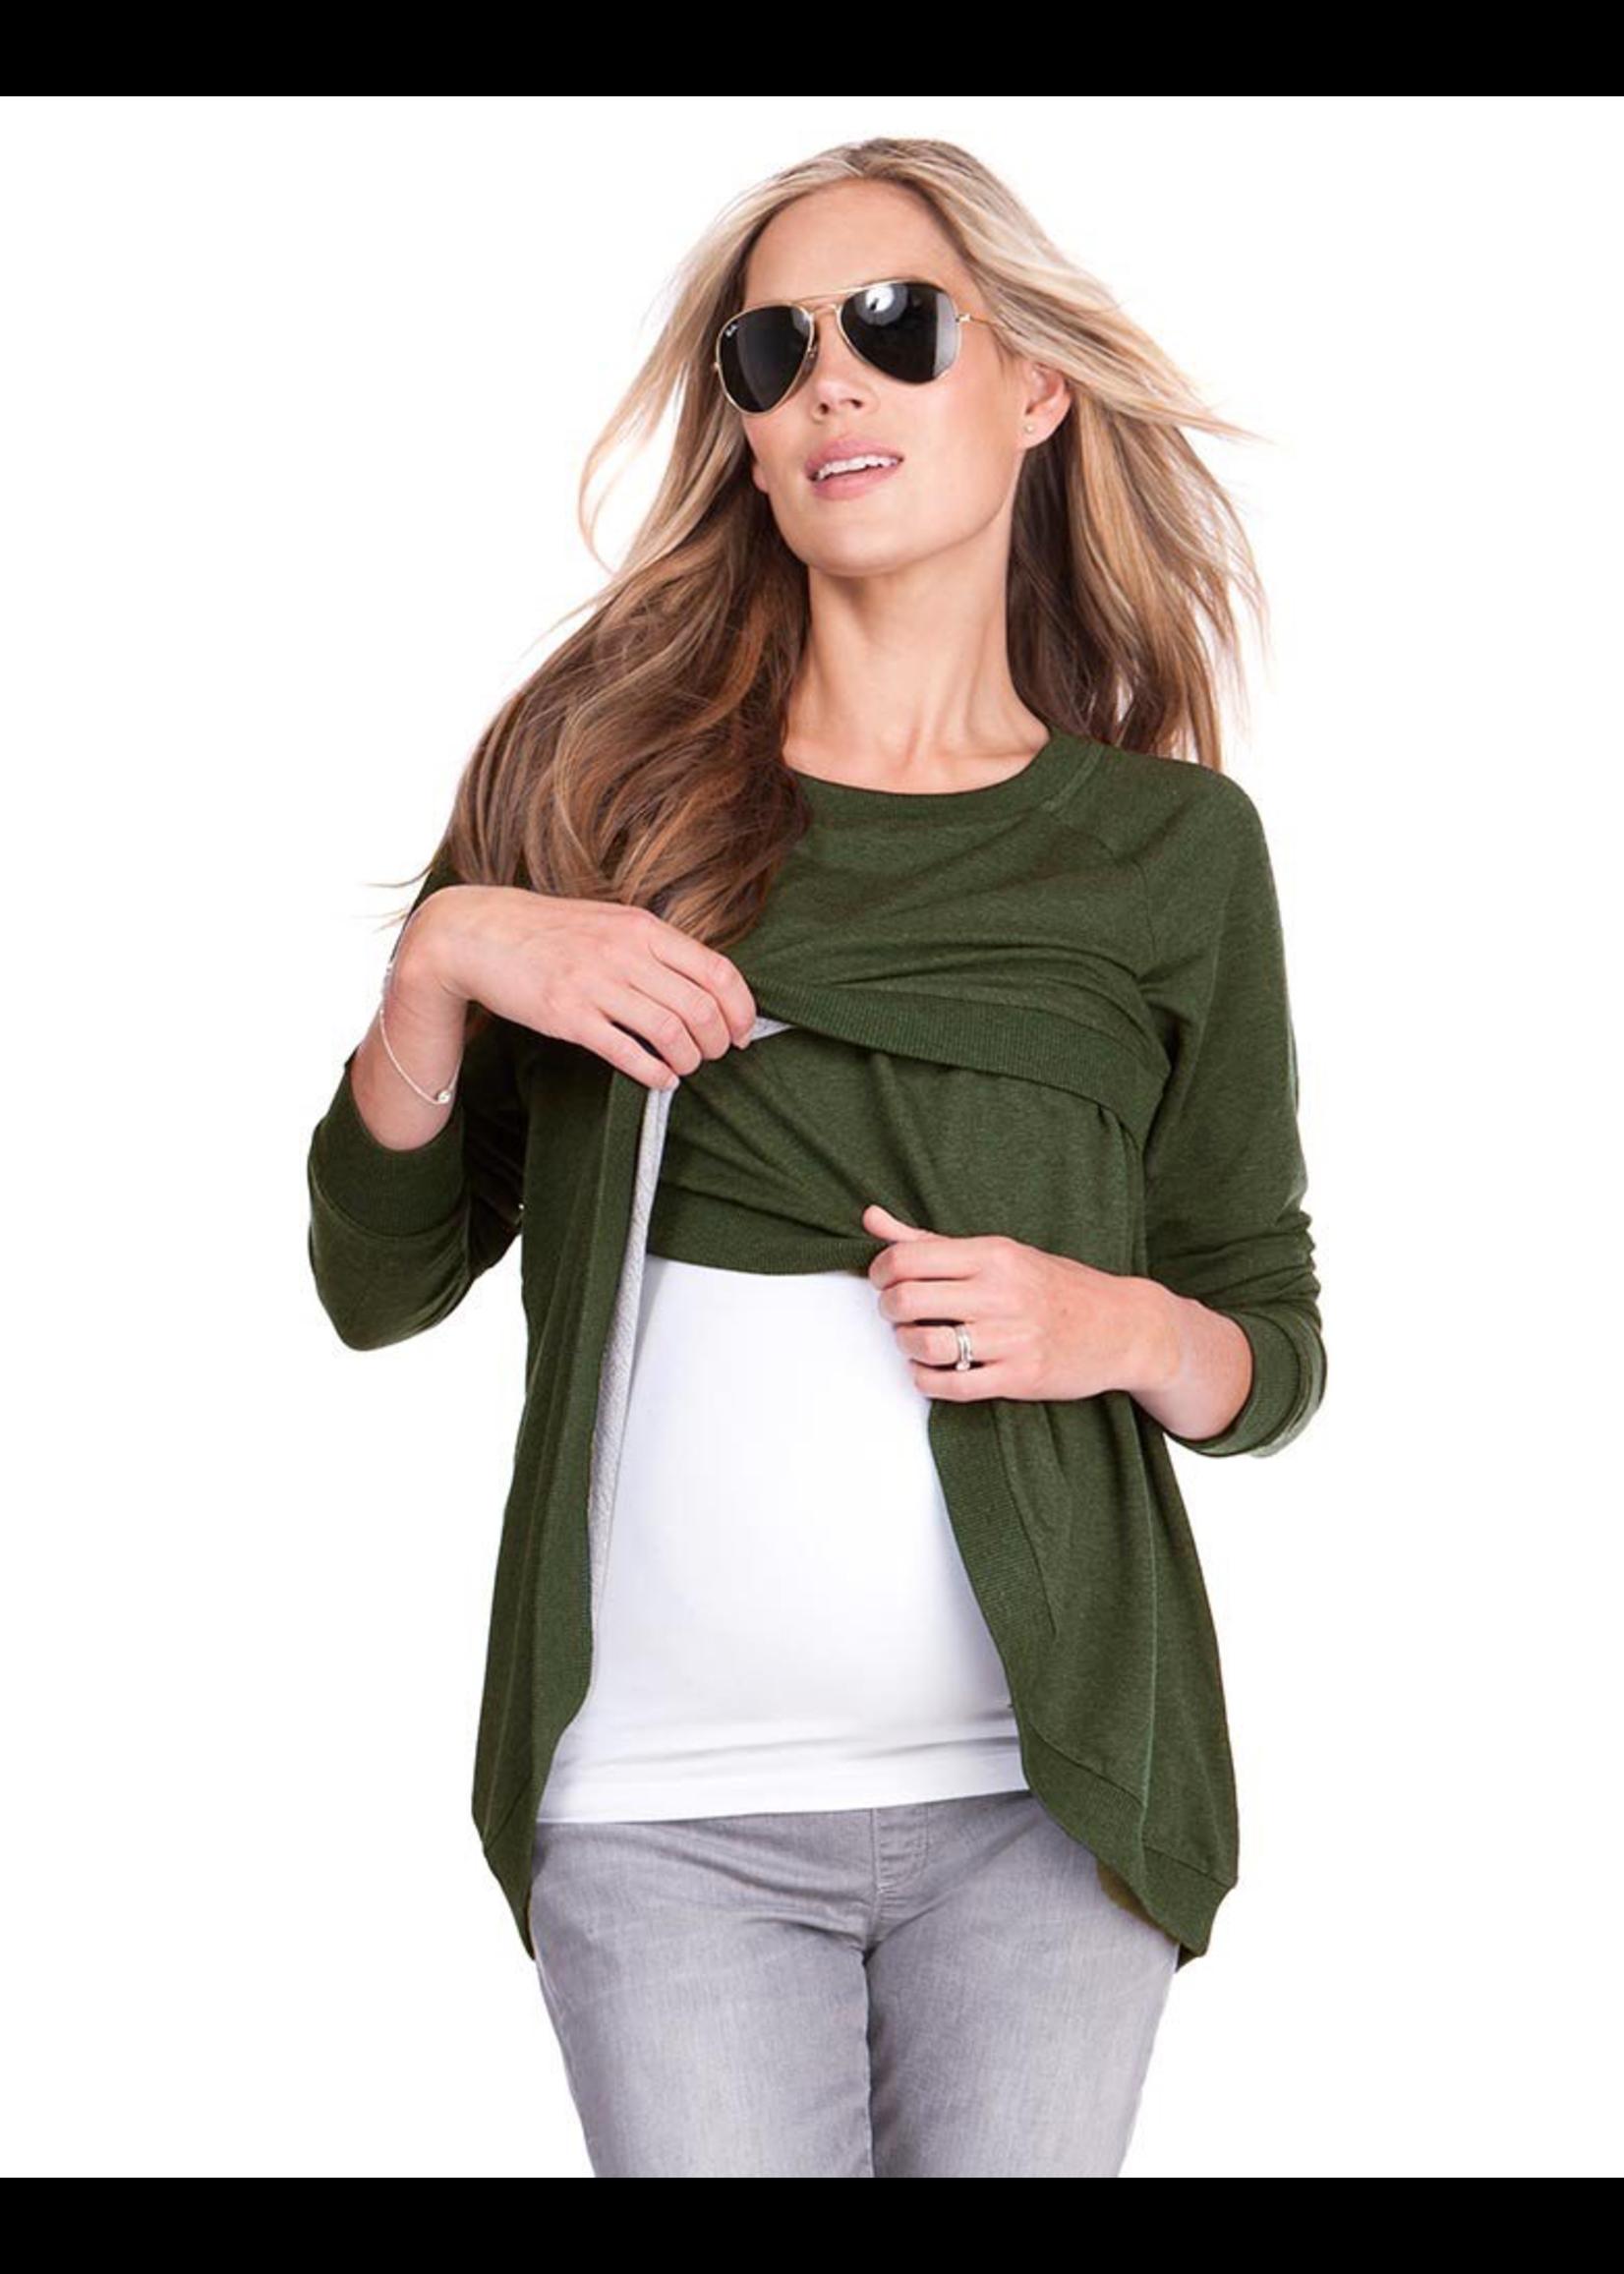 Seraphine Seraphine, Sybil, Crossover Maternity & Nursing Sweater In Olive